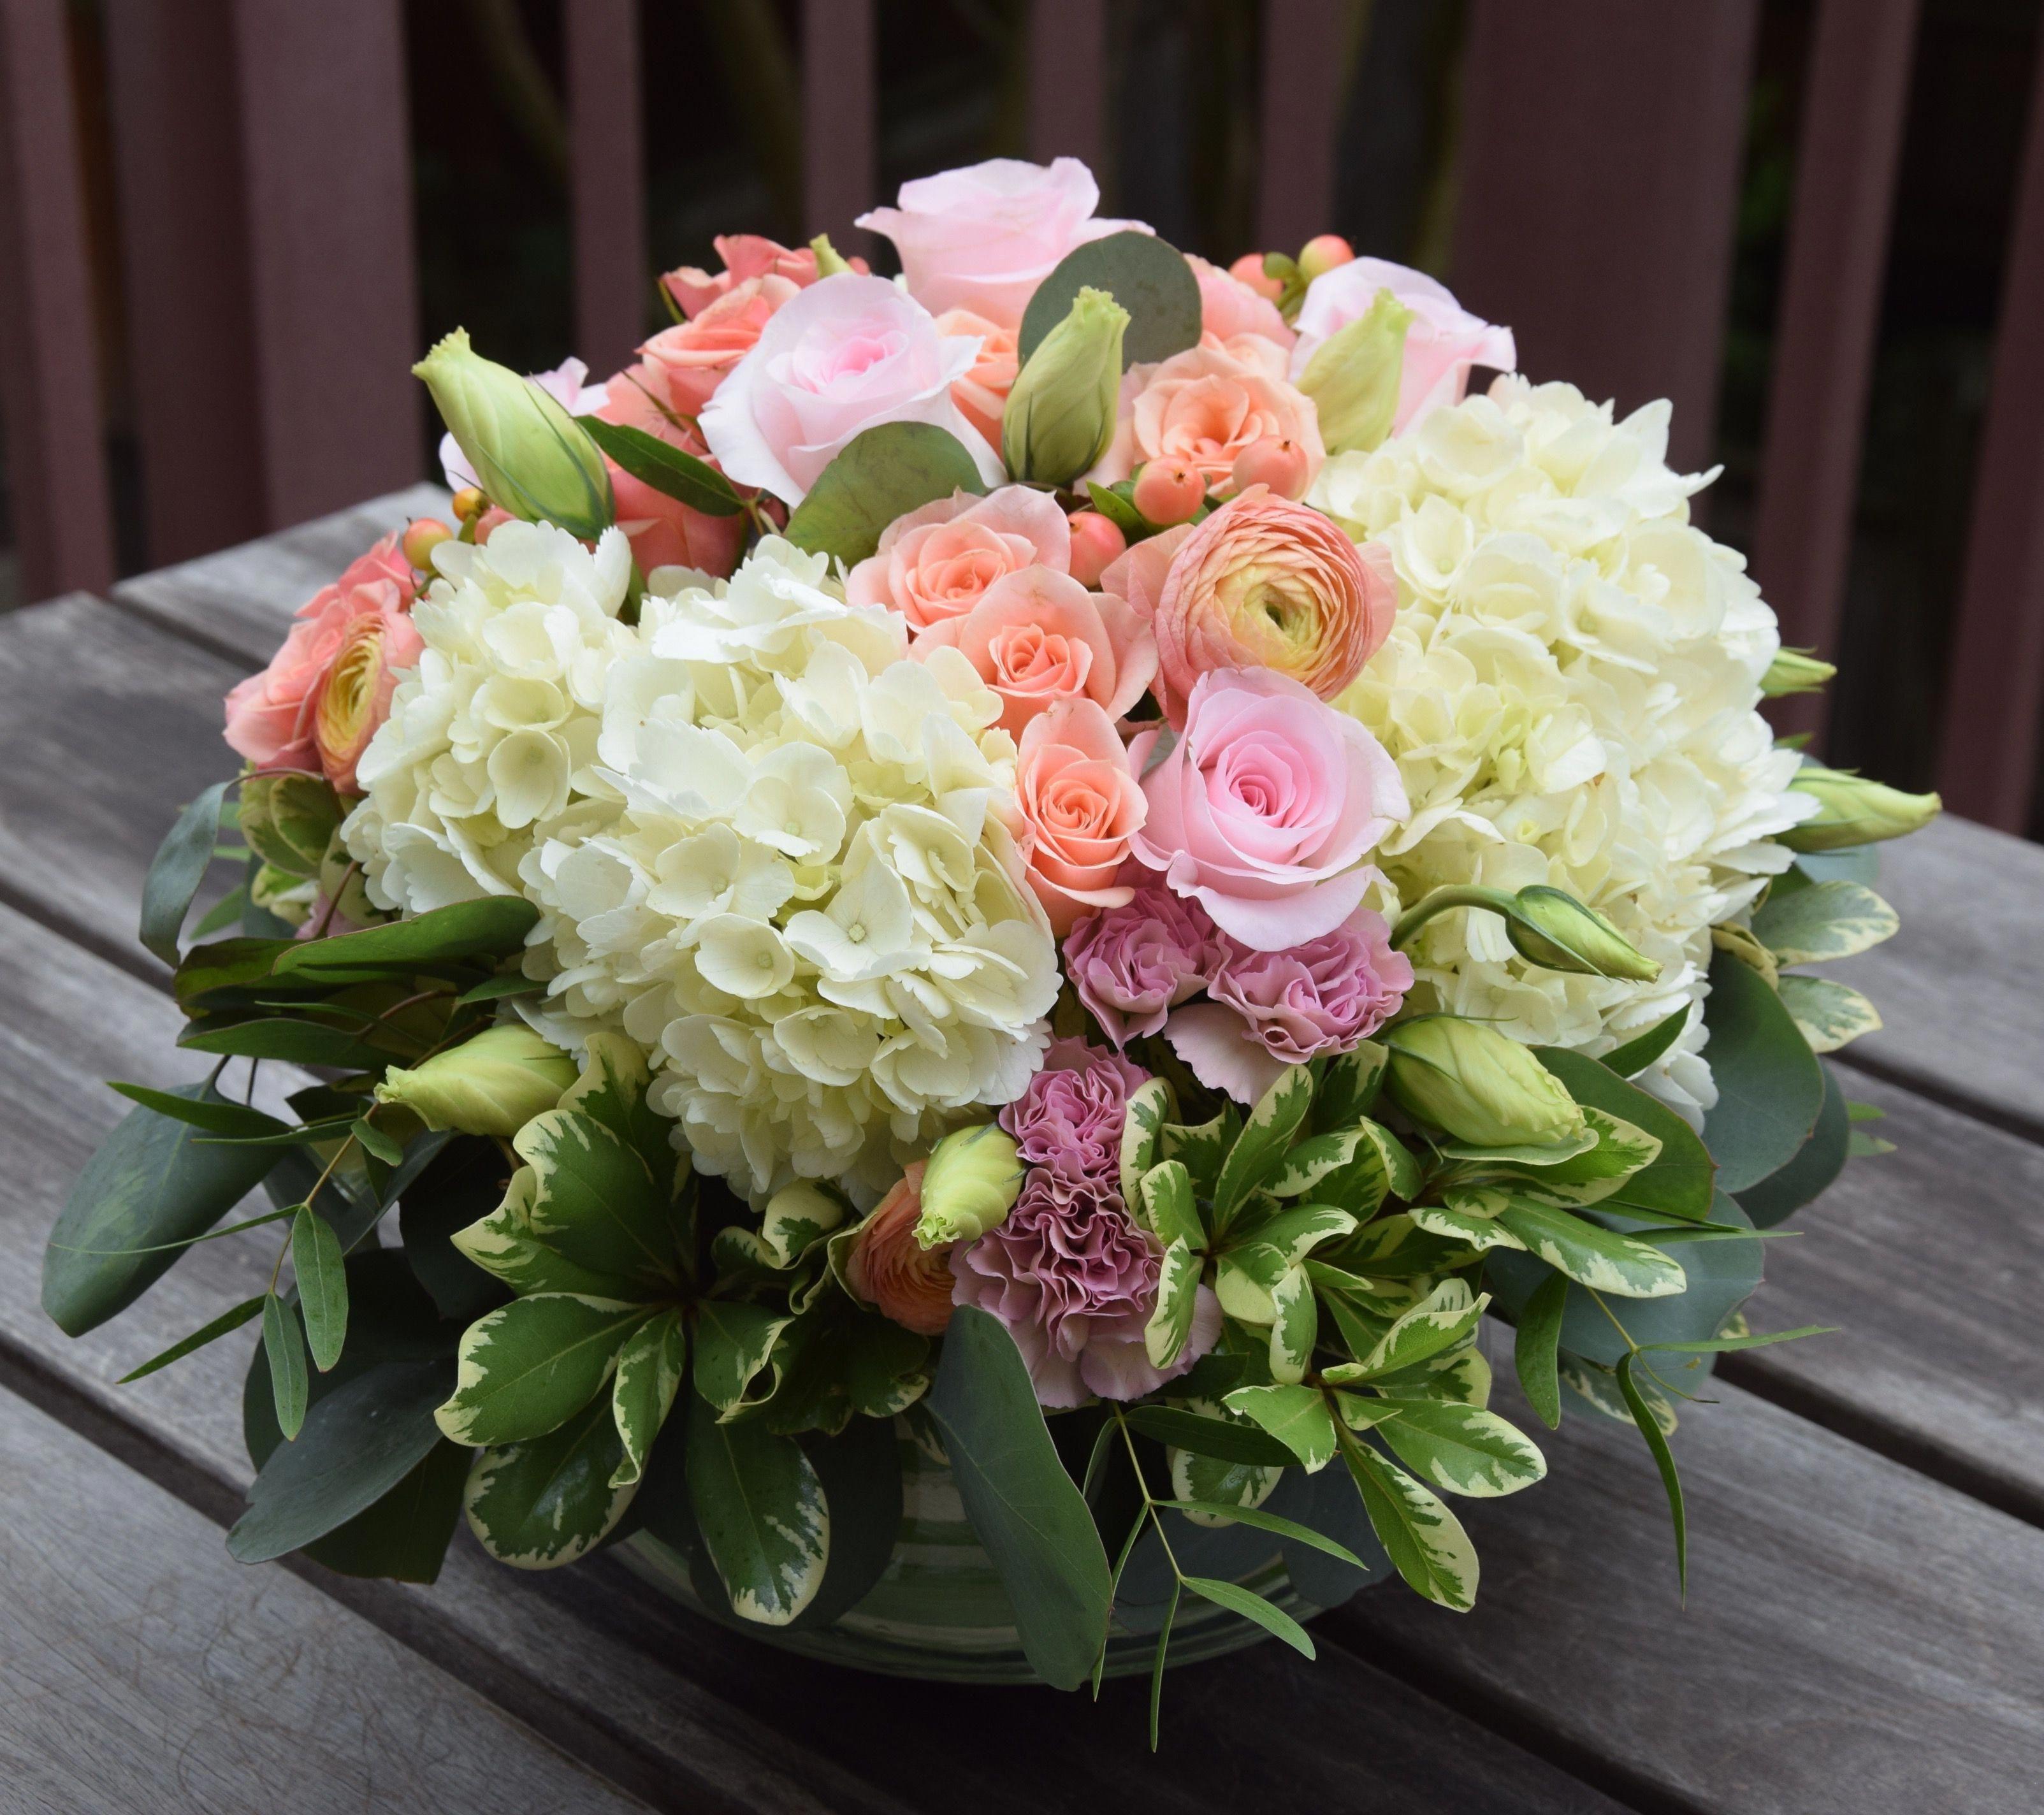 Ranunculus Bouquet Uk Ranunculus Large Flower Arrangements Flower Centerpieces Wedding Summer Flower Arrangements